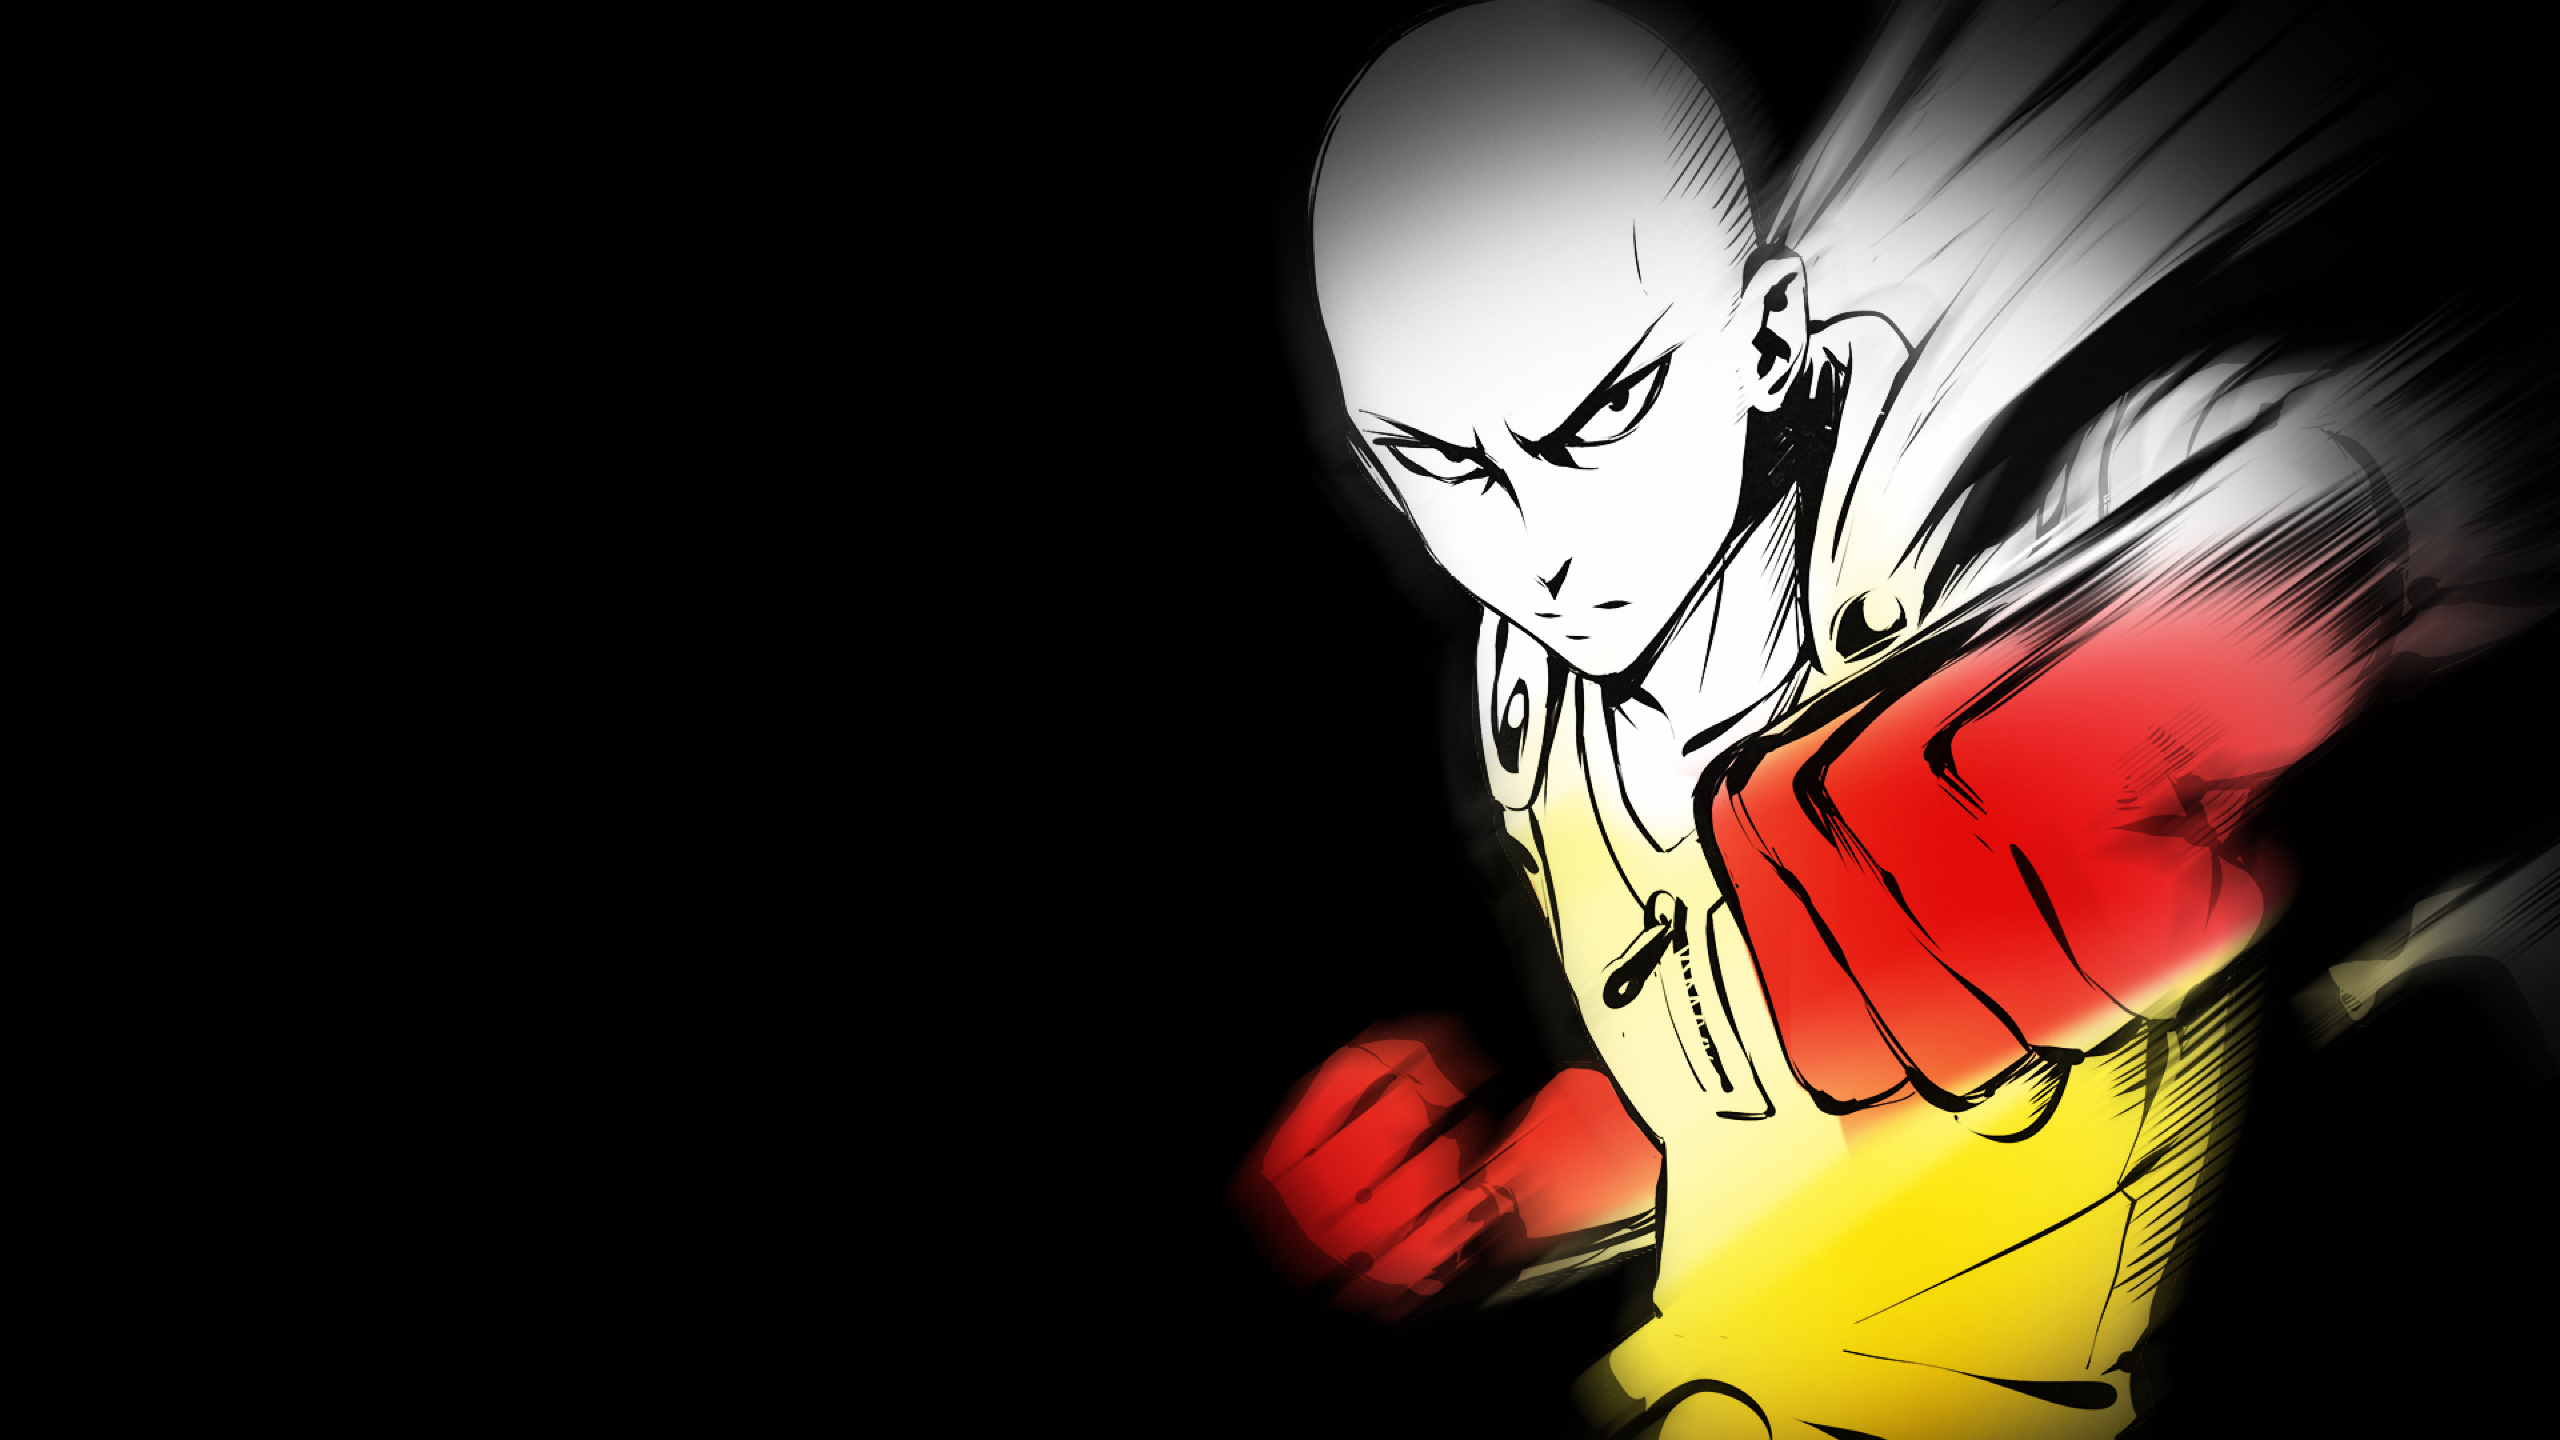 2560x1440 One-Punch Man Saitama 1440P Resolution Wallpaper ...